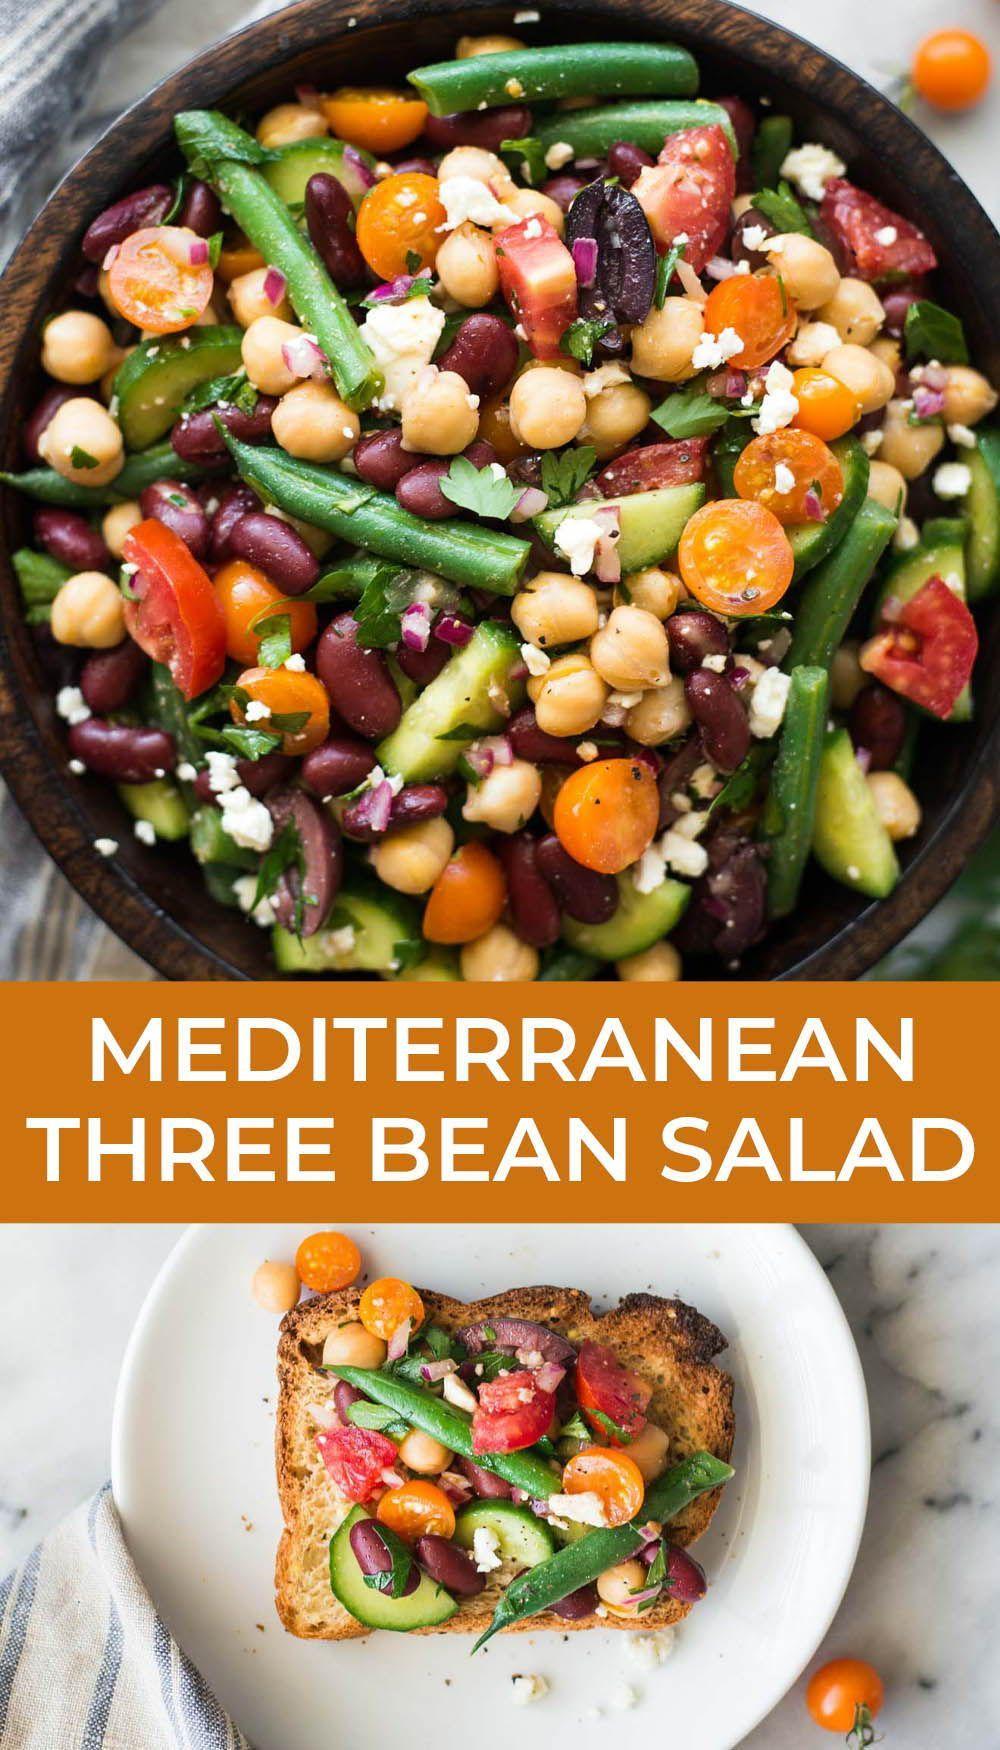 Mediterranean Three Bean Salad Recipe